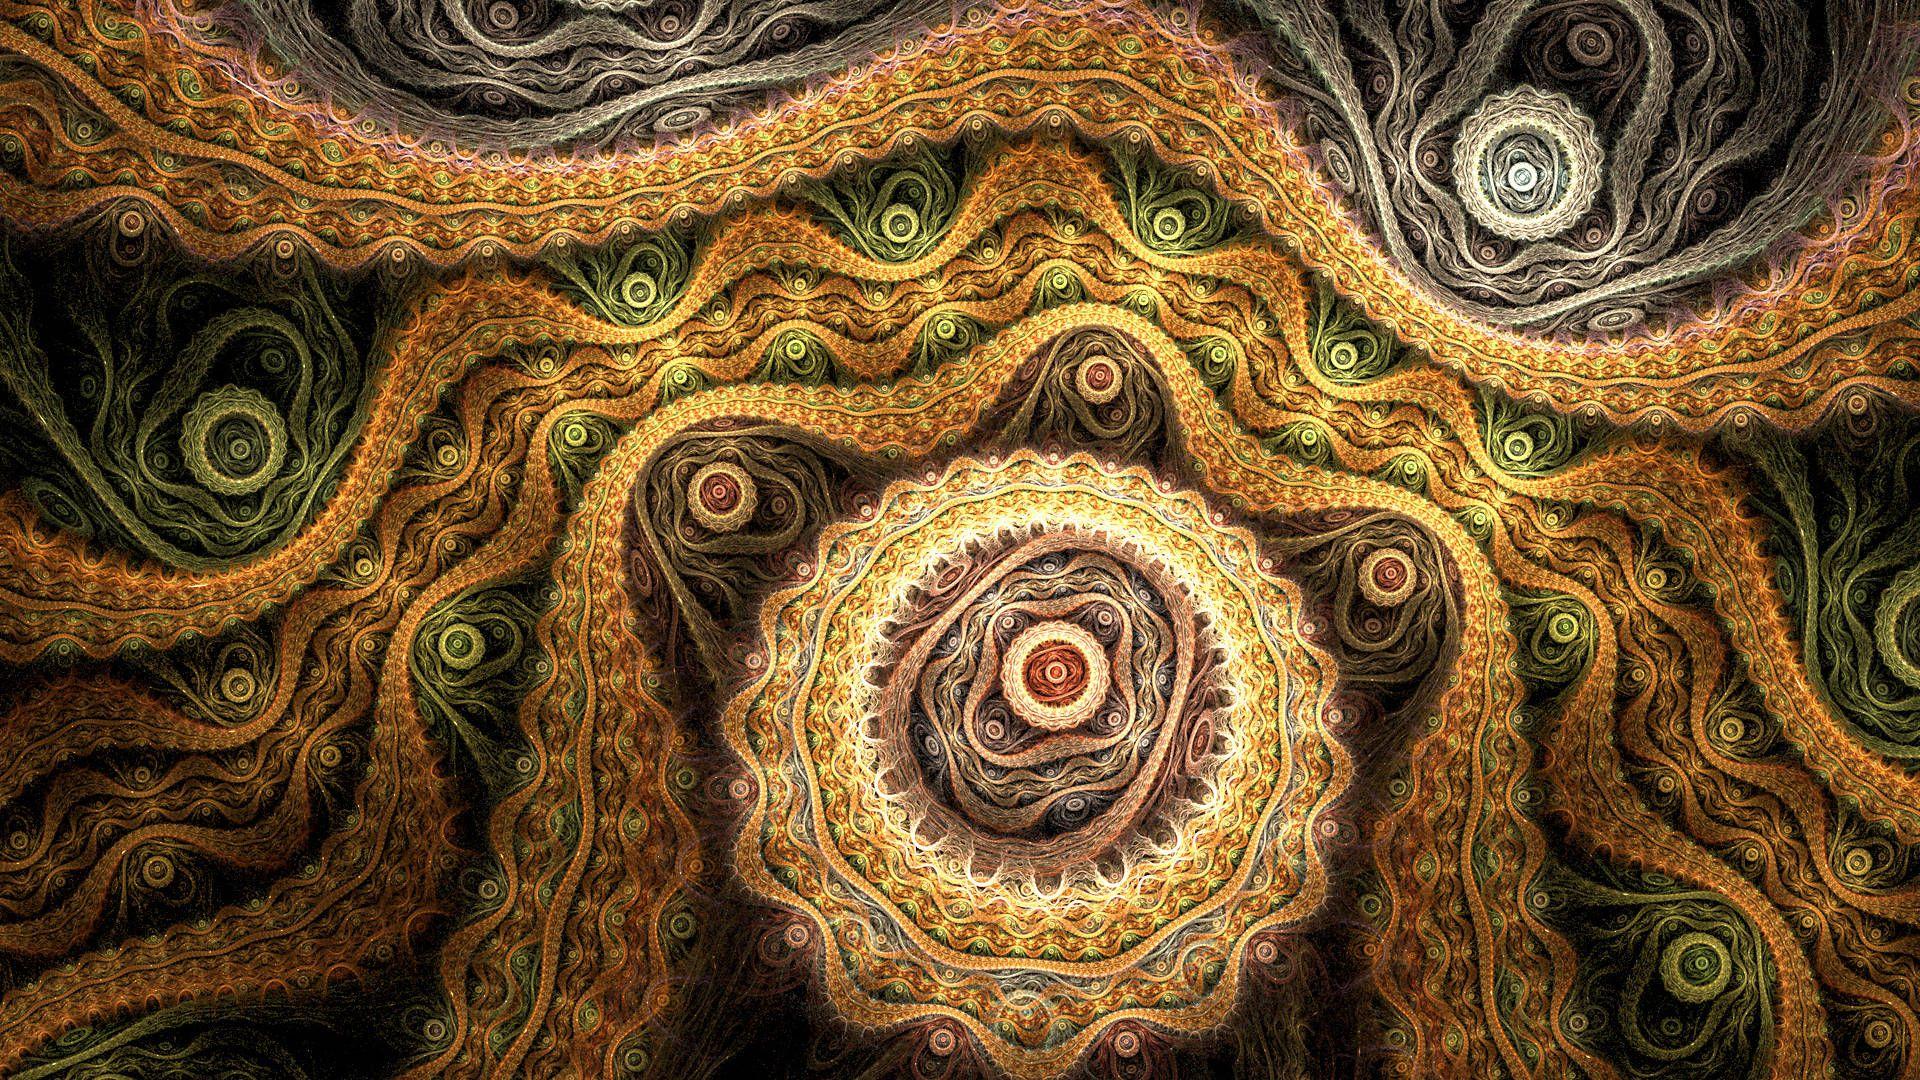 Fractal Wallpaper 1920x1080 Abstract Wallpaper Fractals Cool Backgrounds